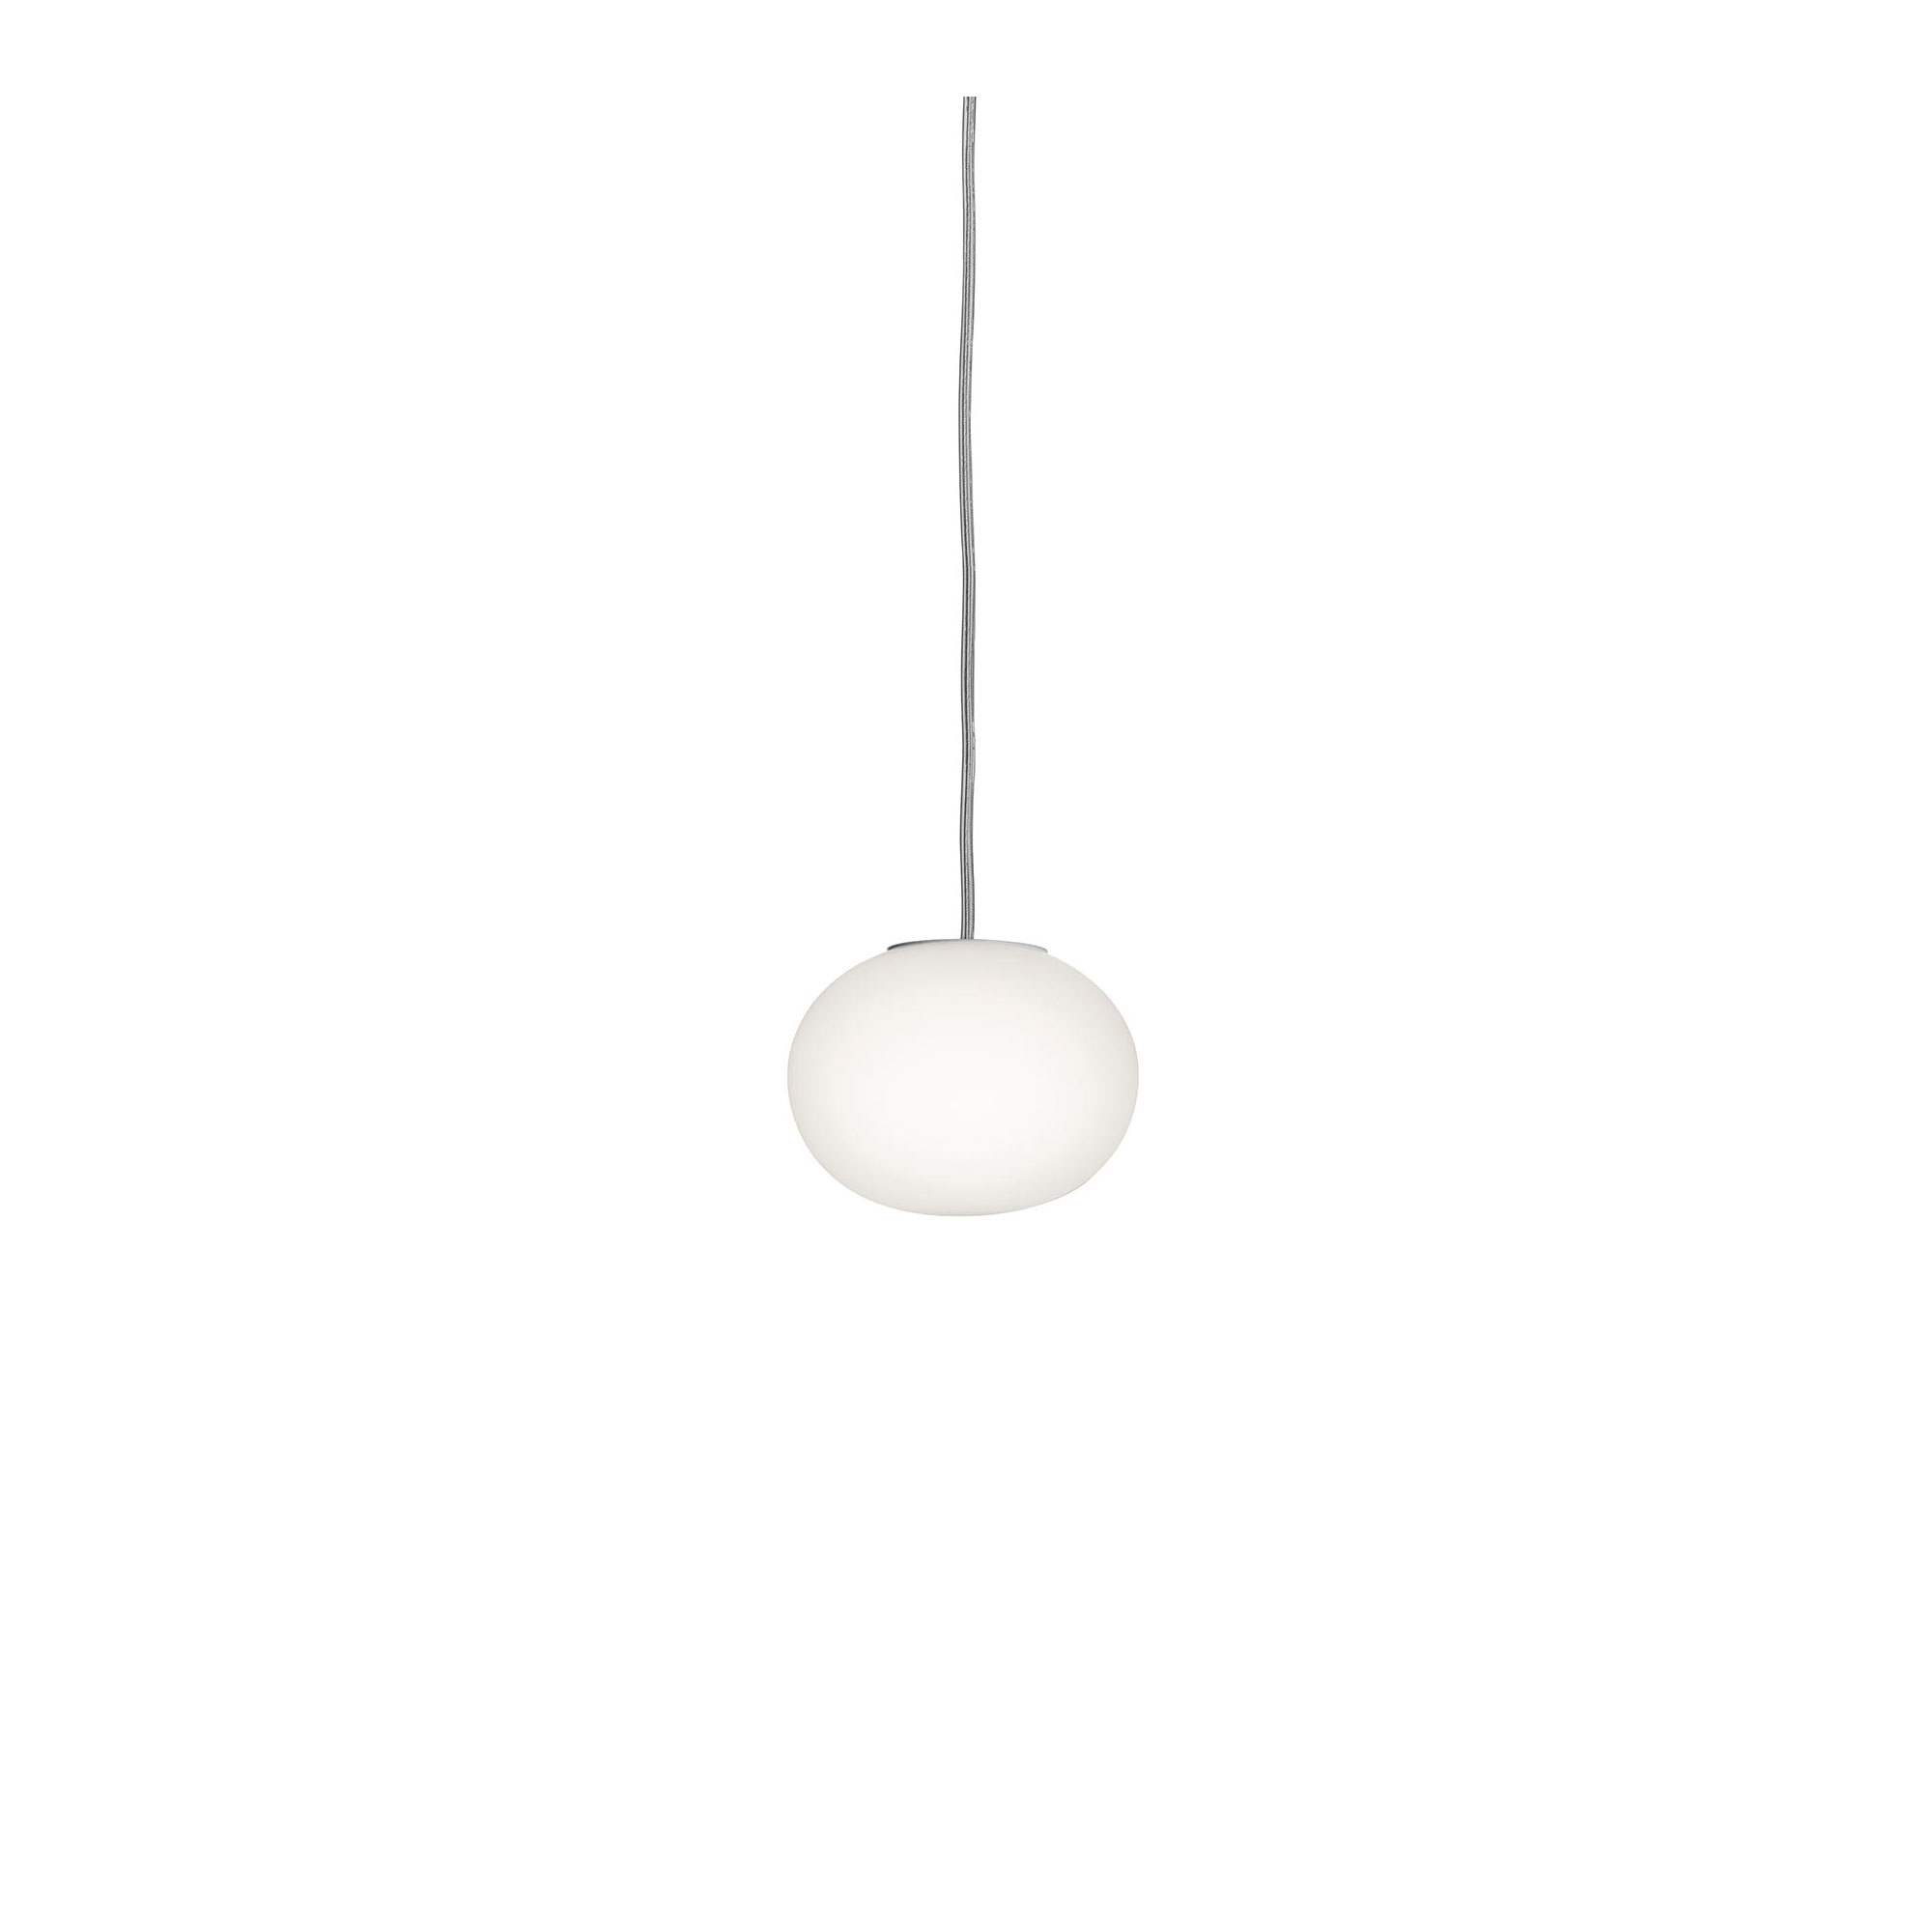 10010401_1 Elegantes Flos Glo Ball S Dekorationen